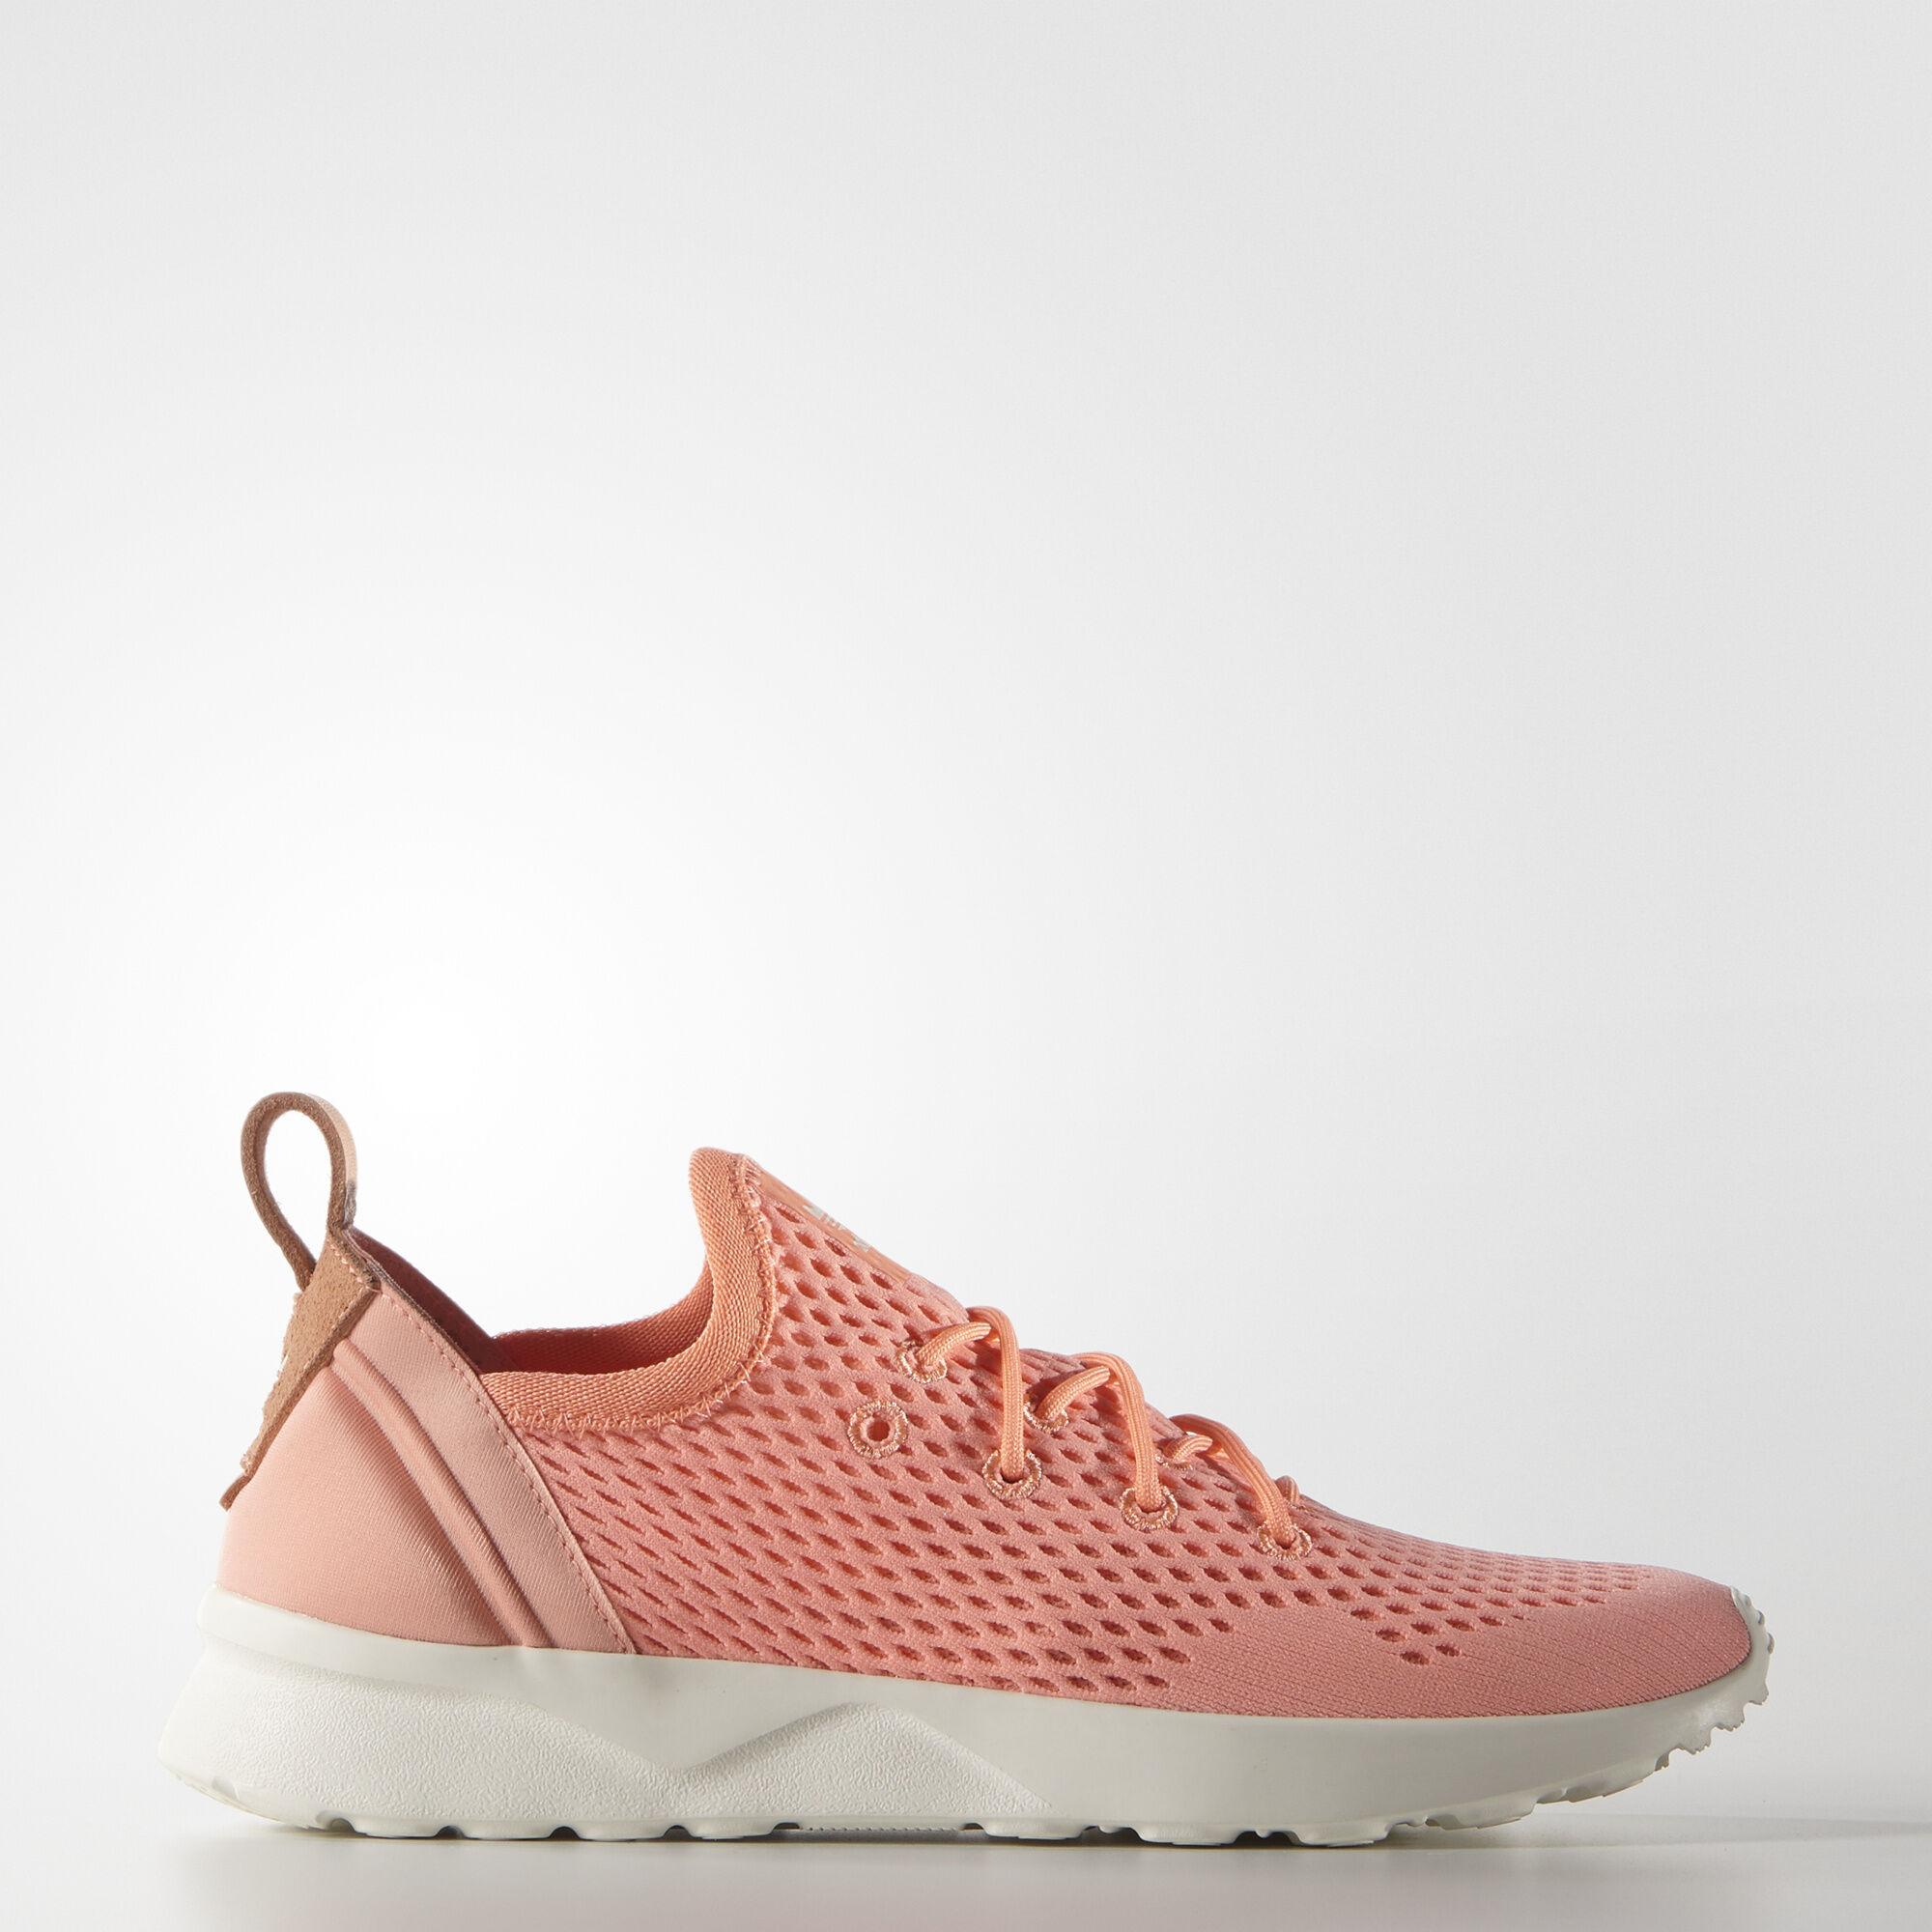 Adidas Flux Adv Tan